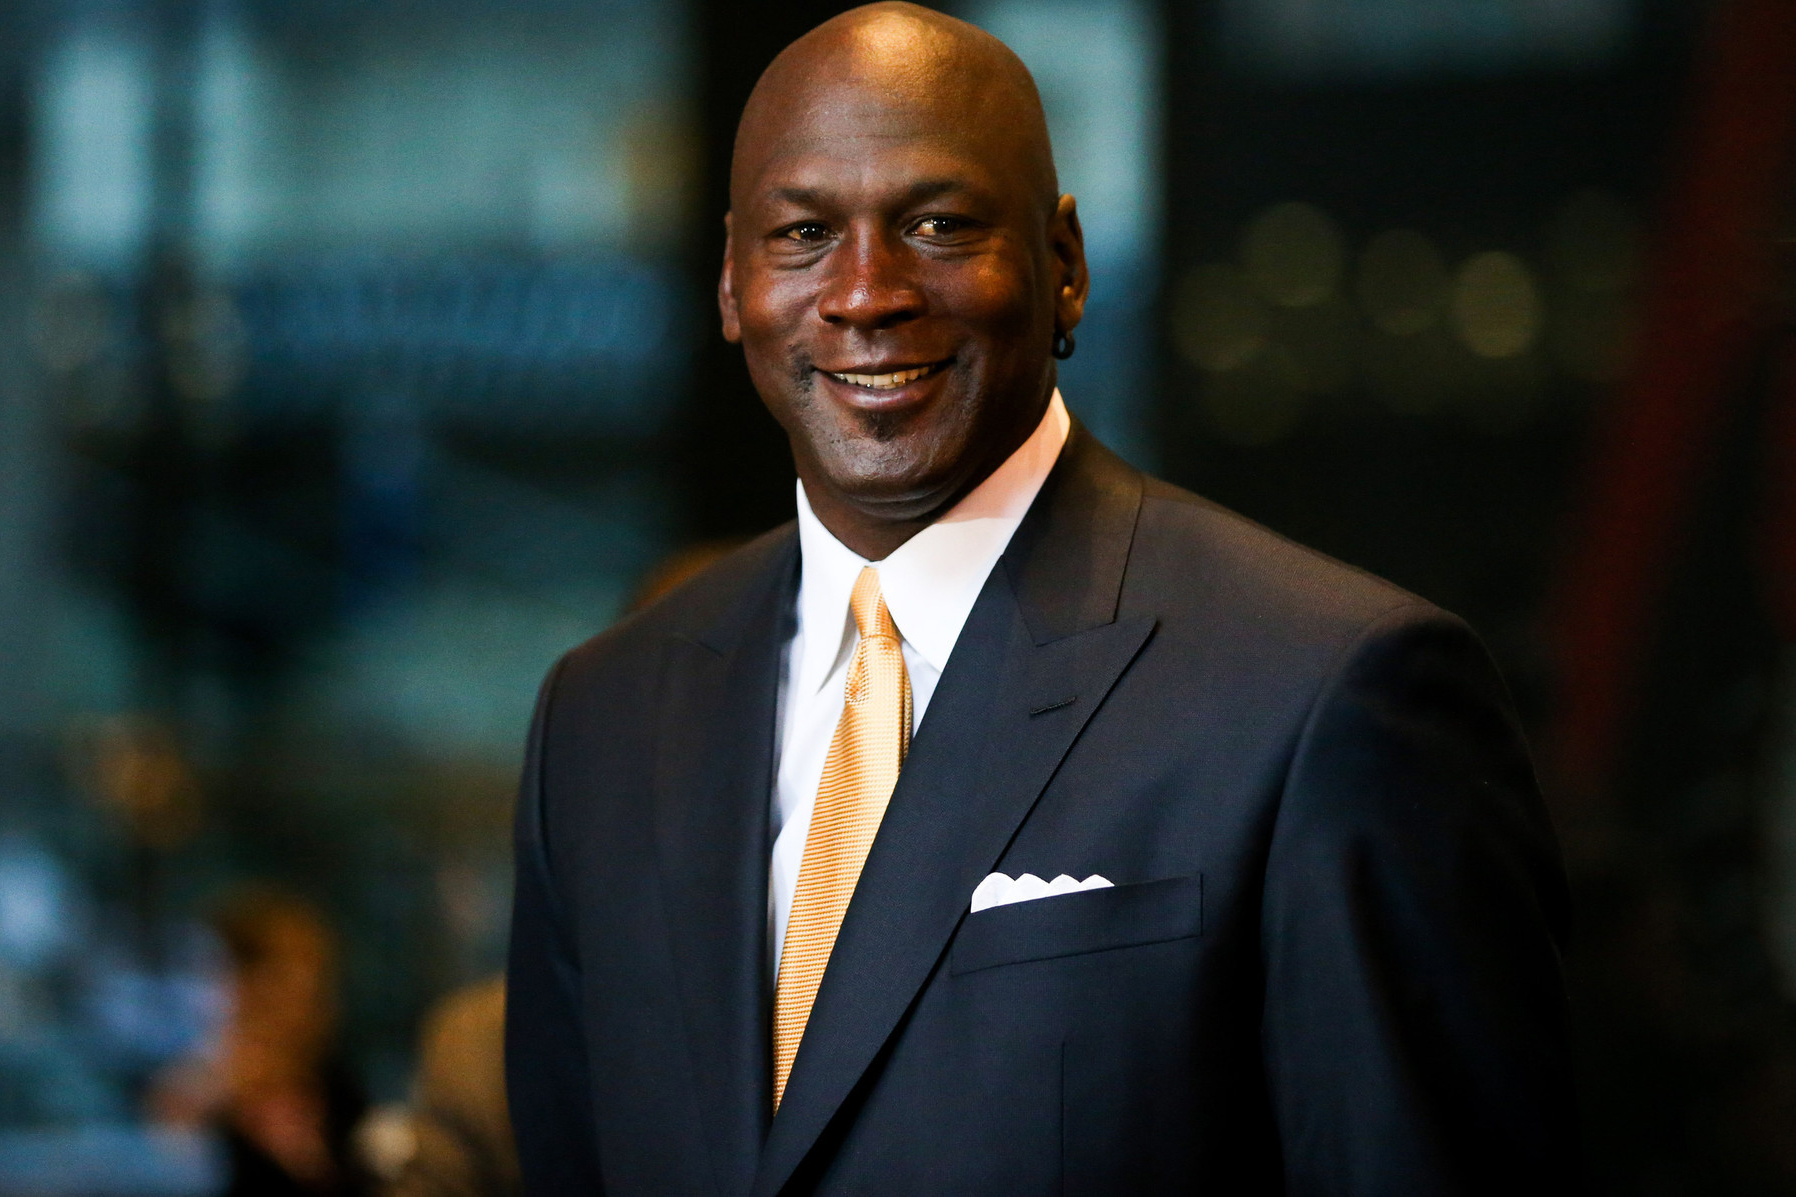 Michael Jordan dressed formally